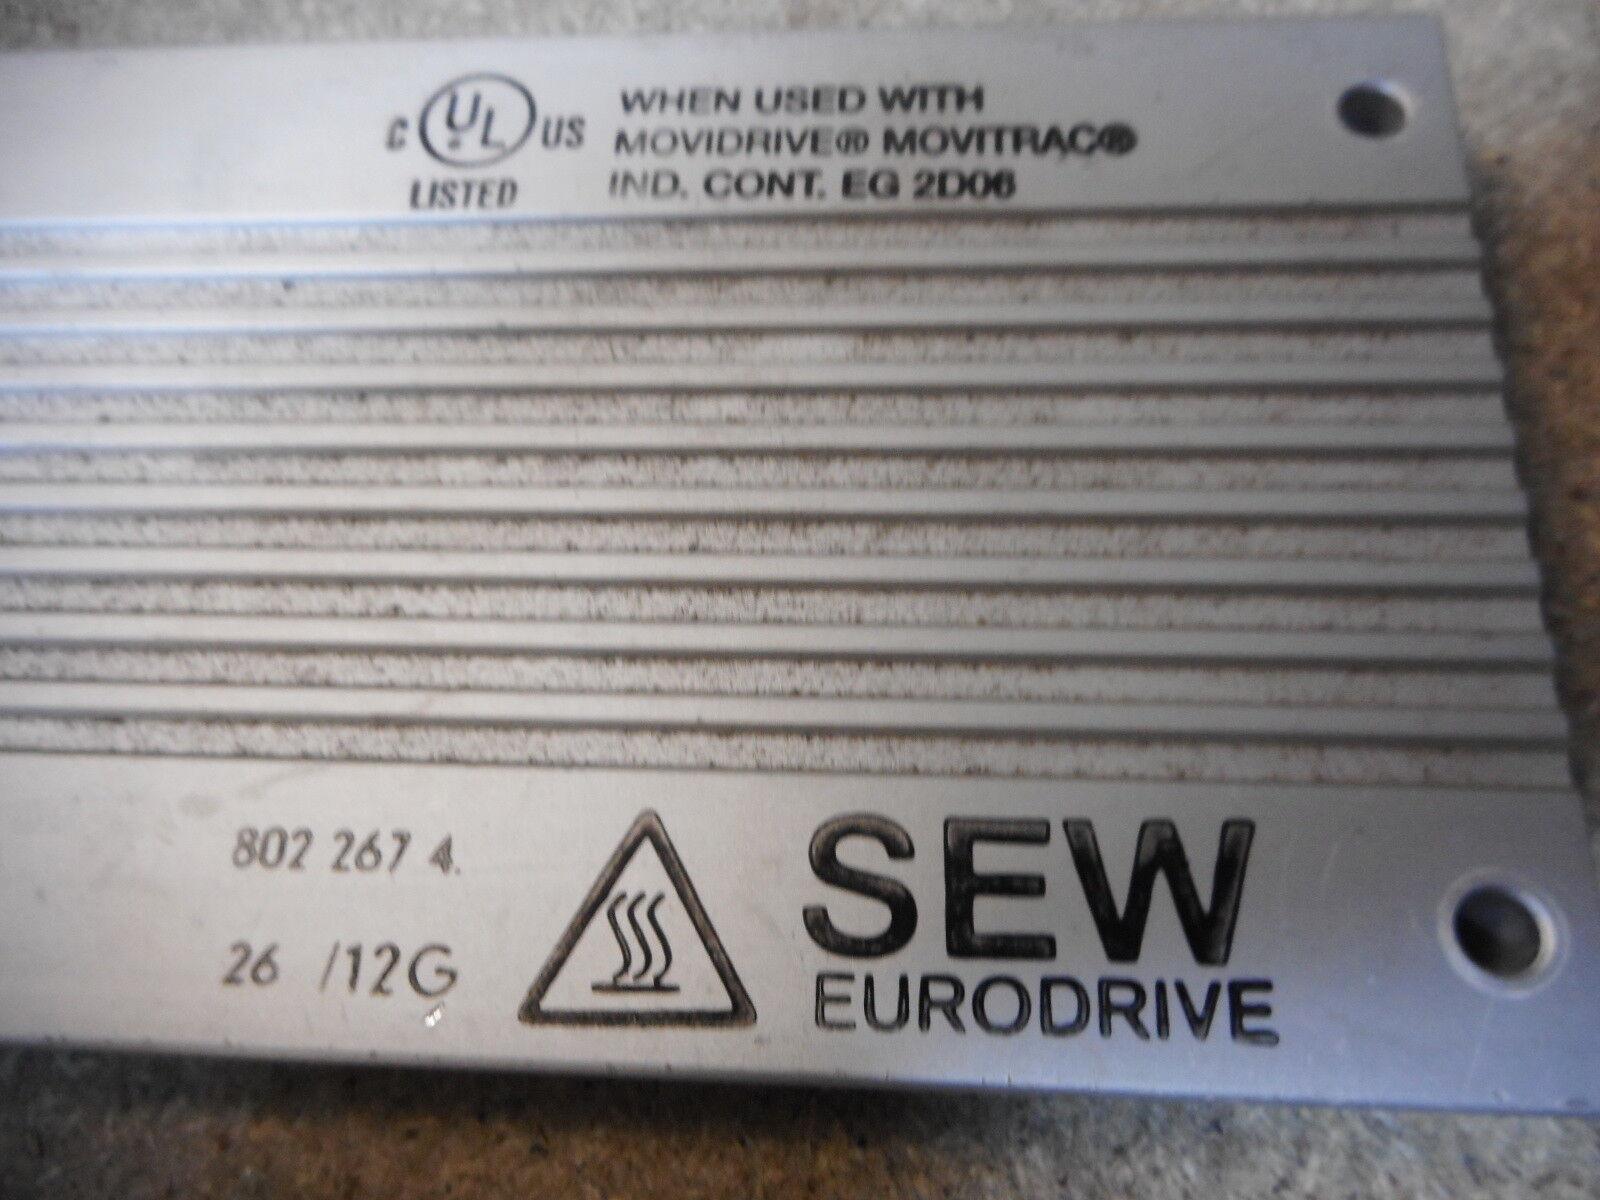 BRAKE RESISTOR BW 200-005 SEW EURO-DRIVE 826 270.5 200ohm 500watt